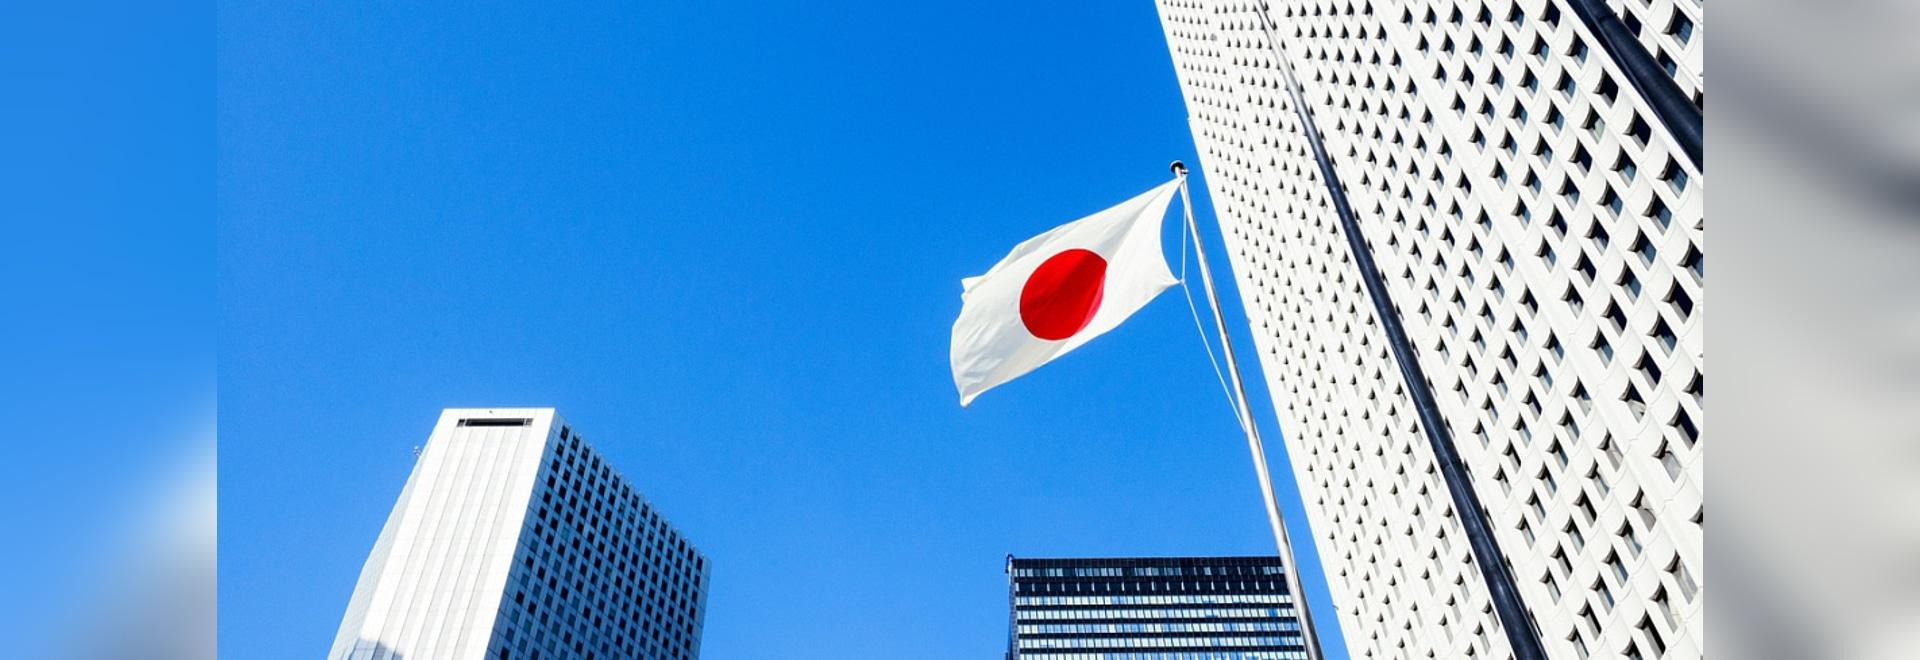 [JIMTOF 2018] Coverage of the Japan International Machine Tool Fair